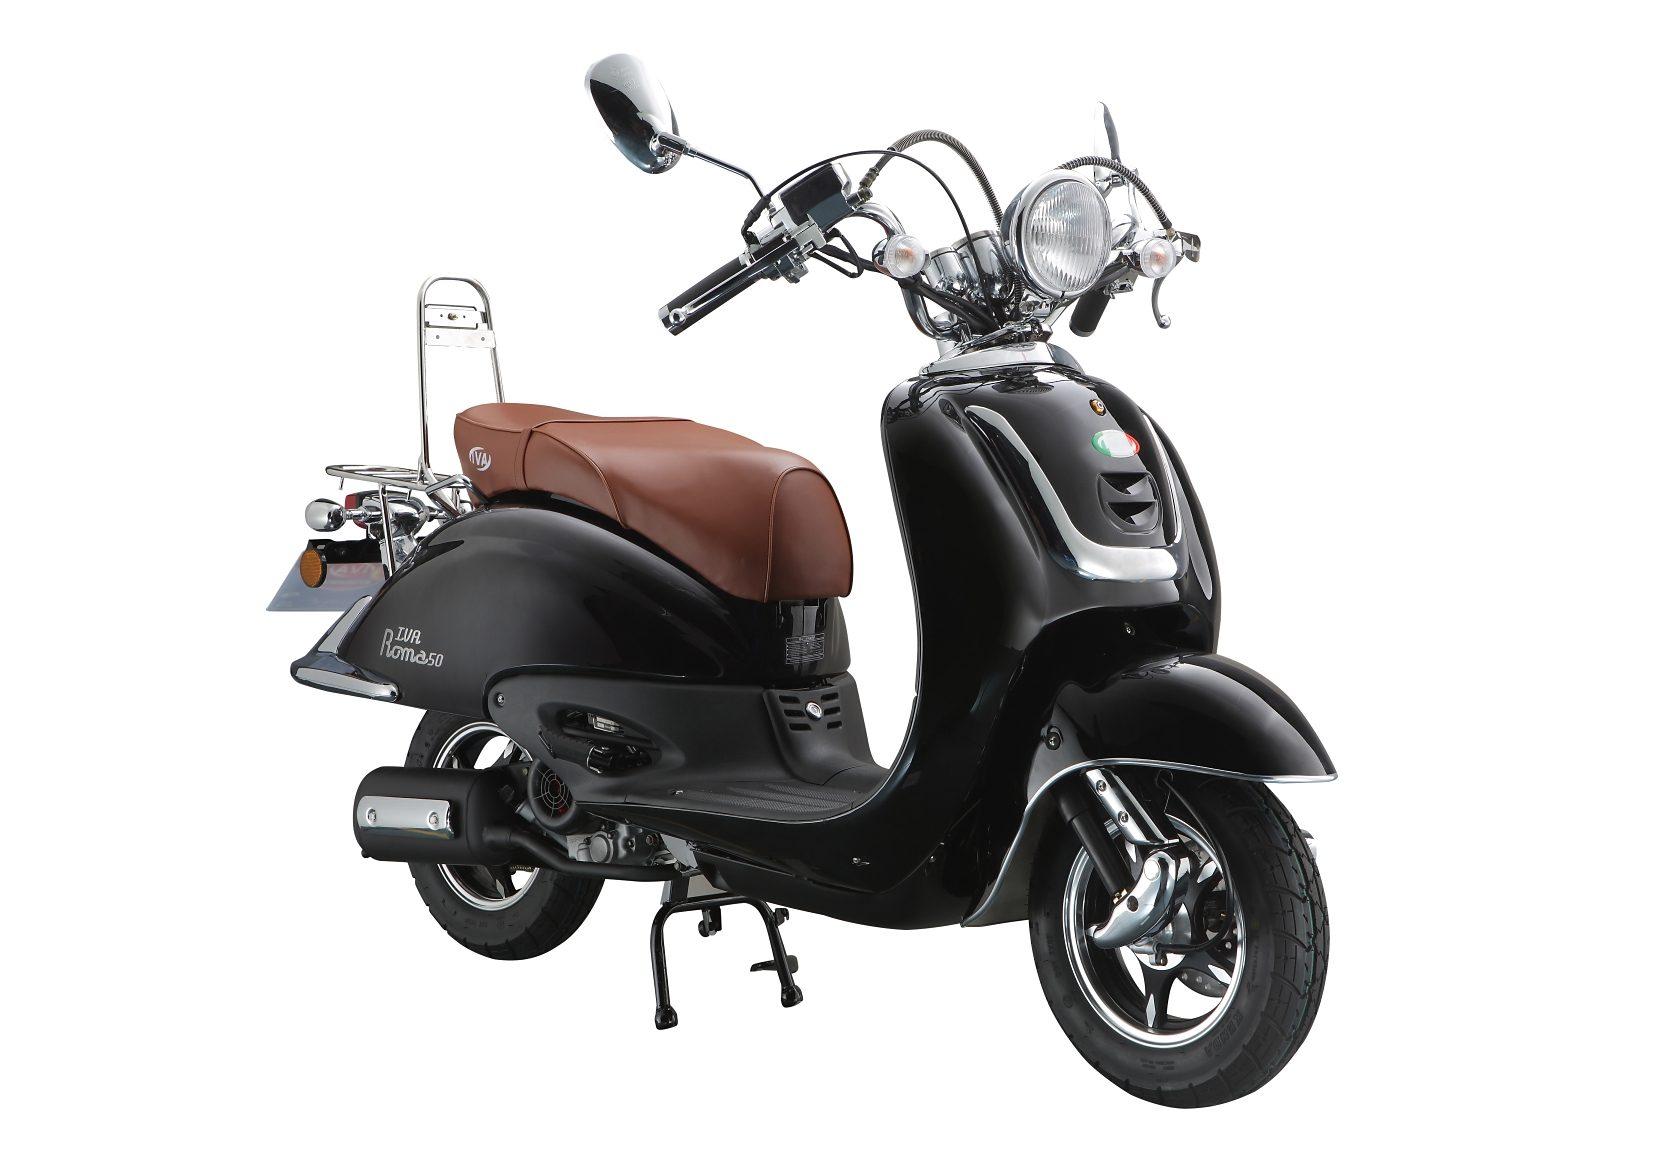 Retro-Mofaroller »RETRO ROMA«, 50 ccm 25 km/h, für 1 Person, schwarz/braun